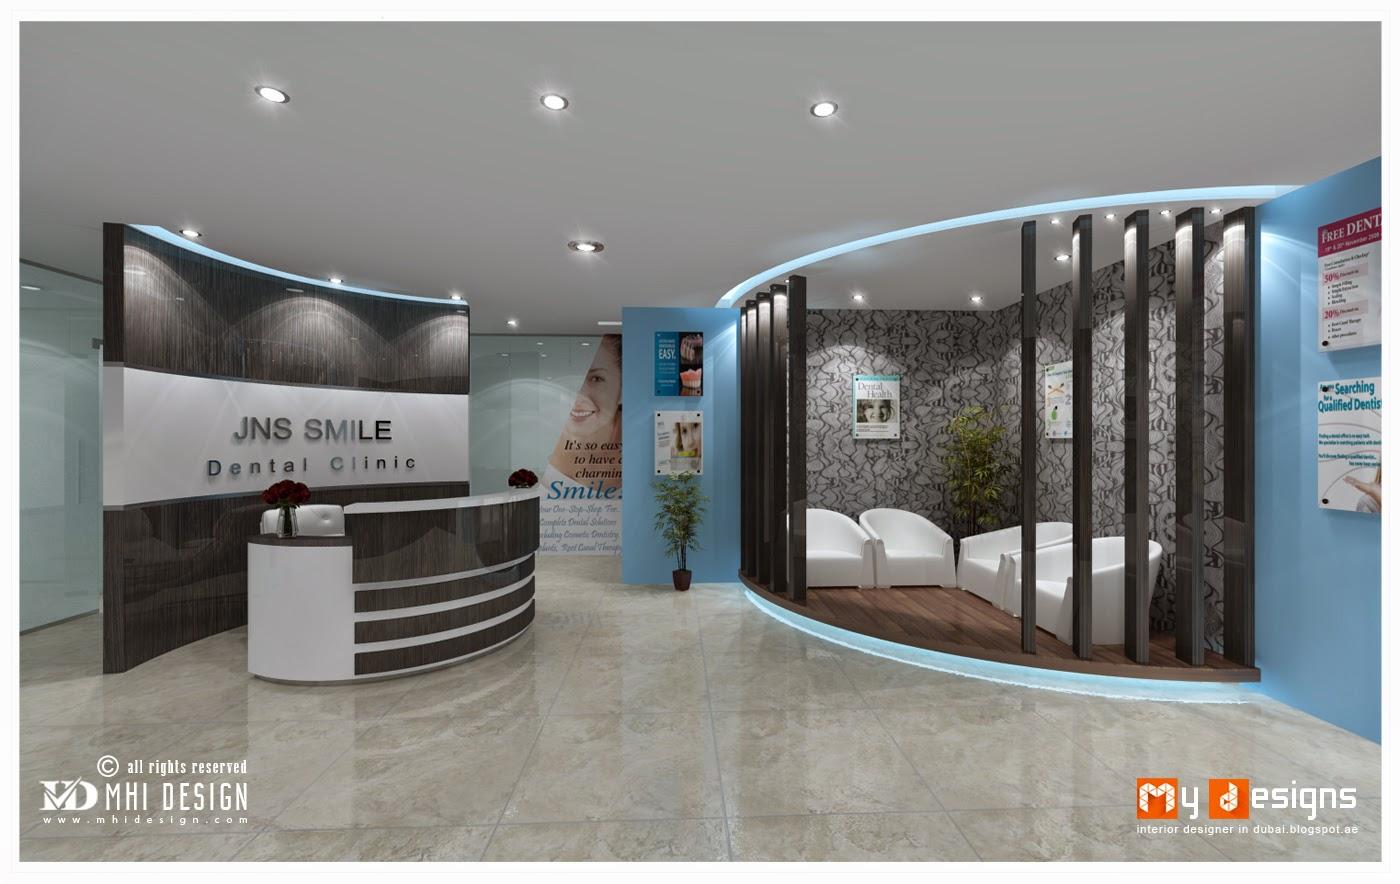 Dubai dental clinic office interior designs in dubai for Dubai villa interior design office